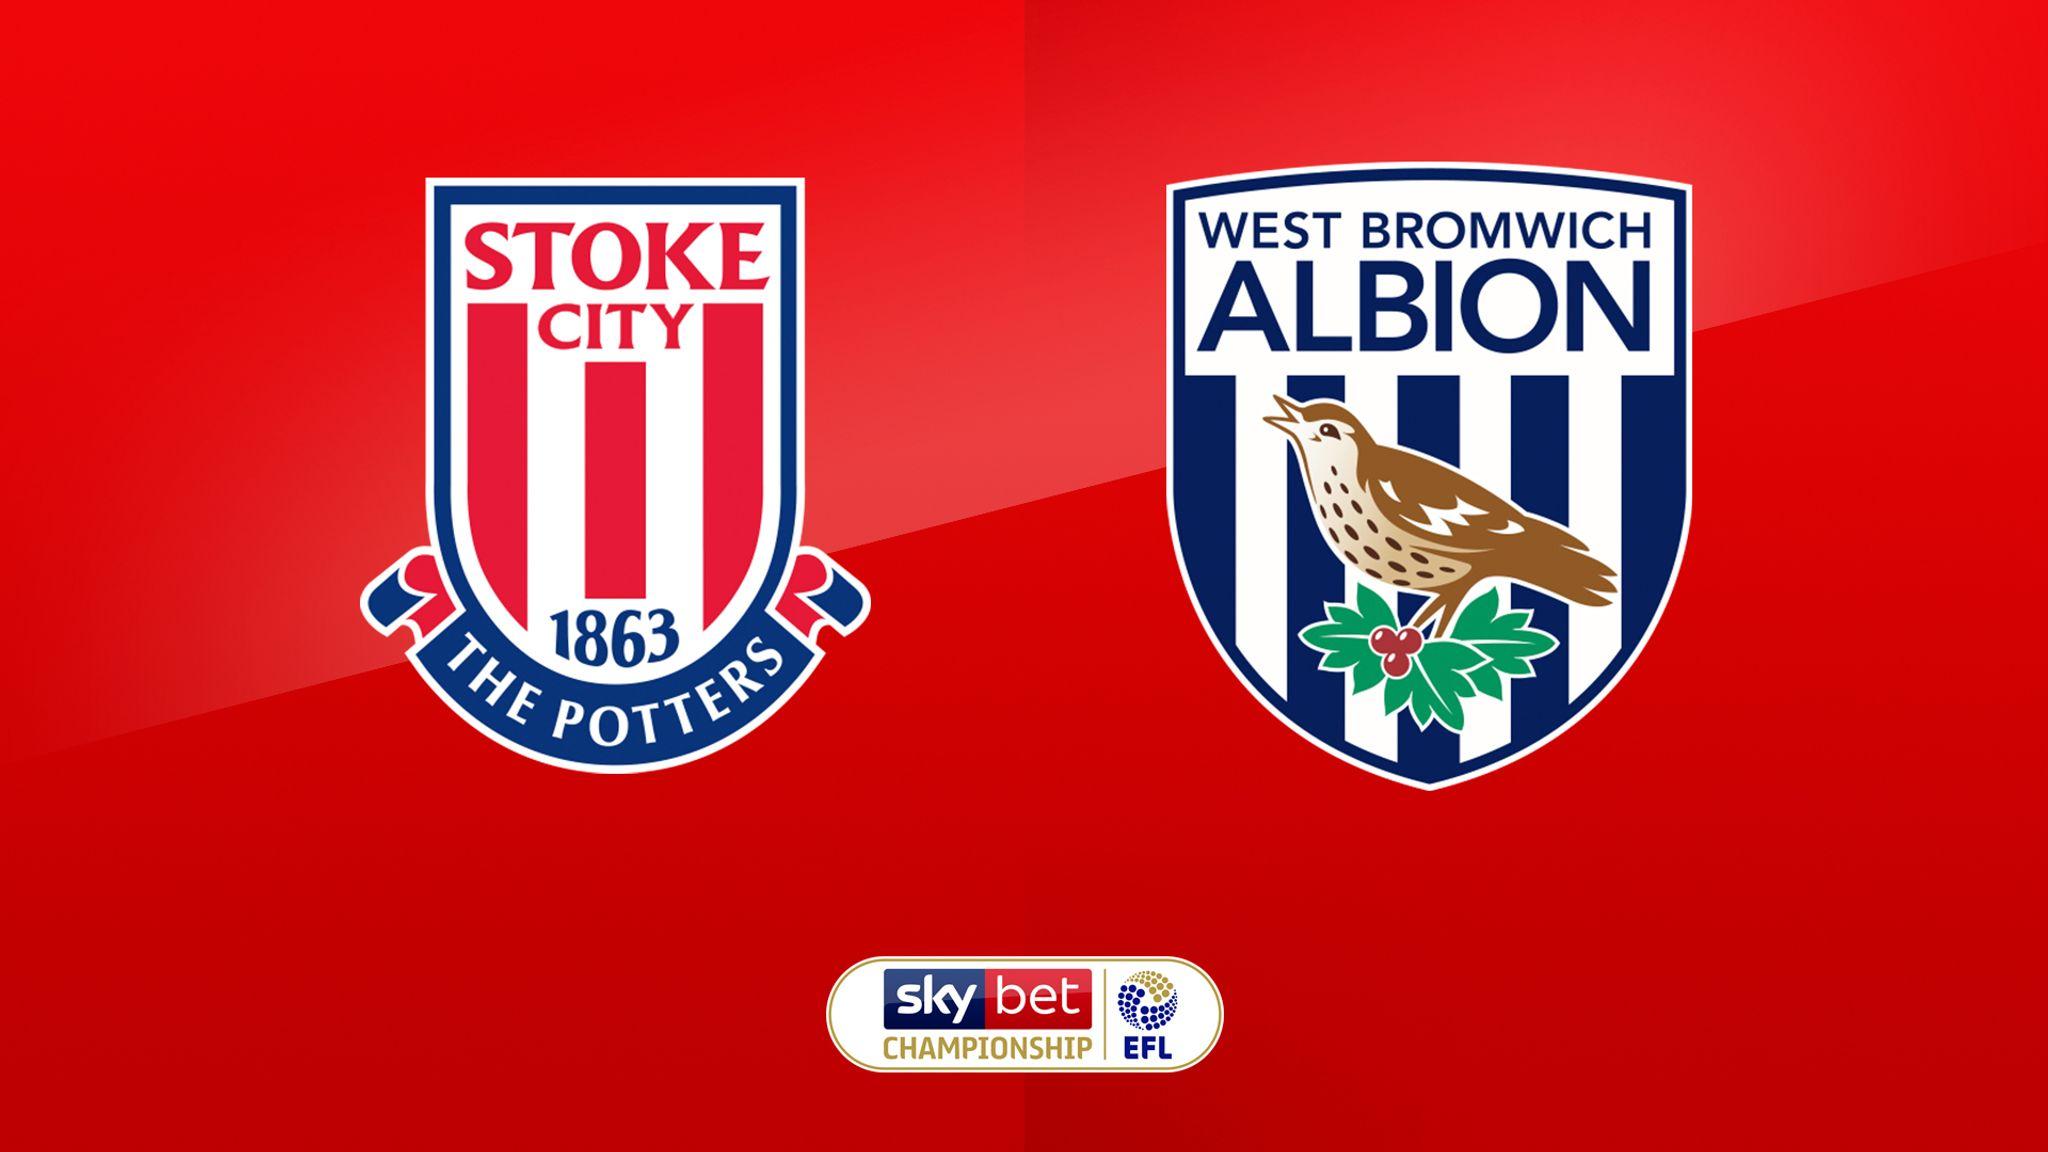 Stoke City vs West Brom Highlights 01 October 2021